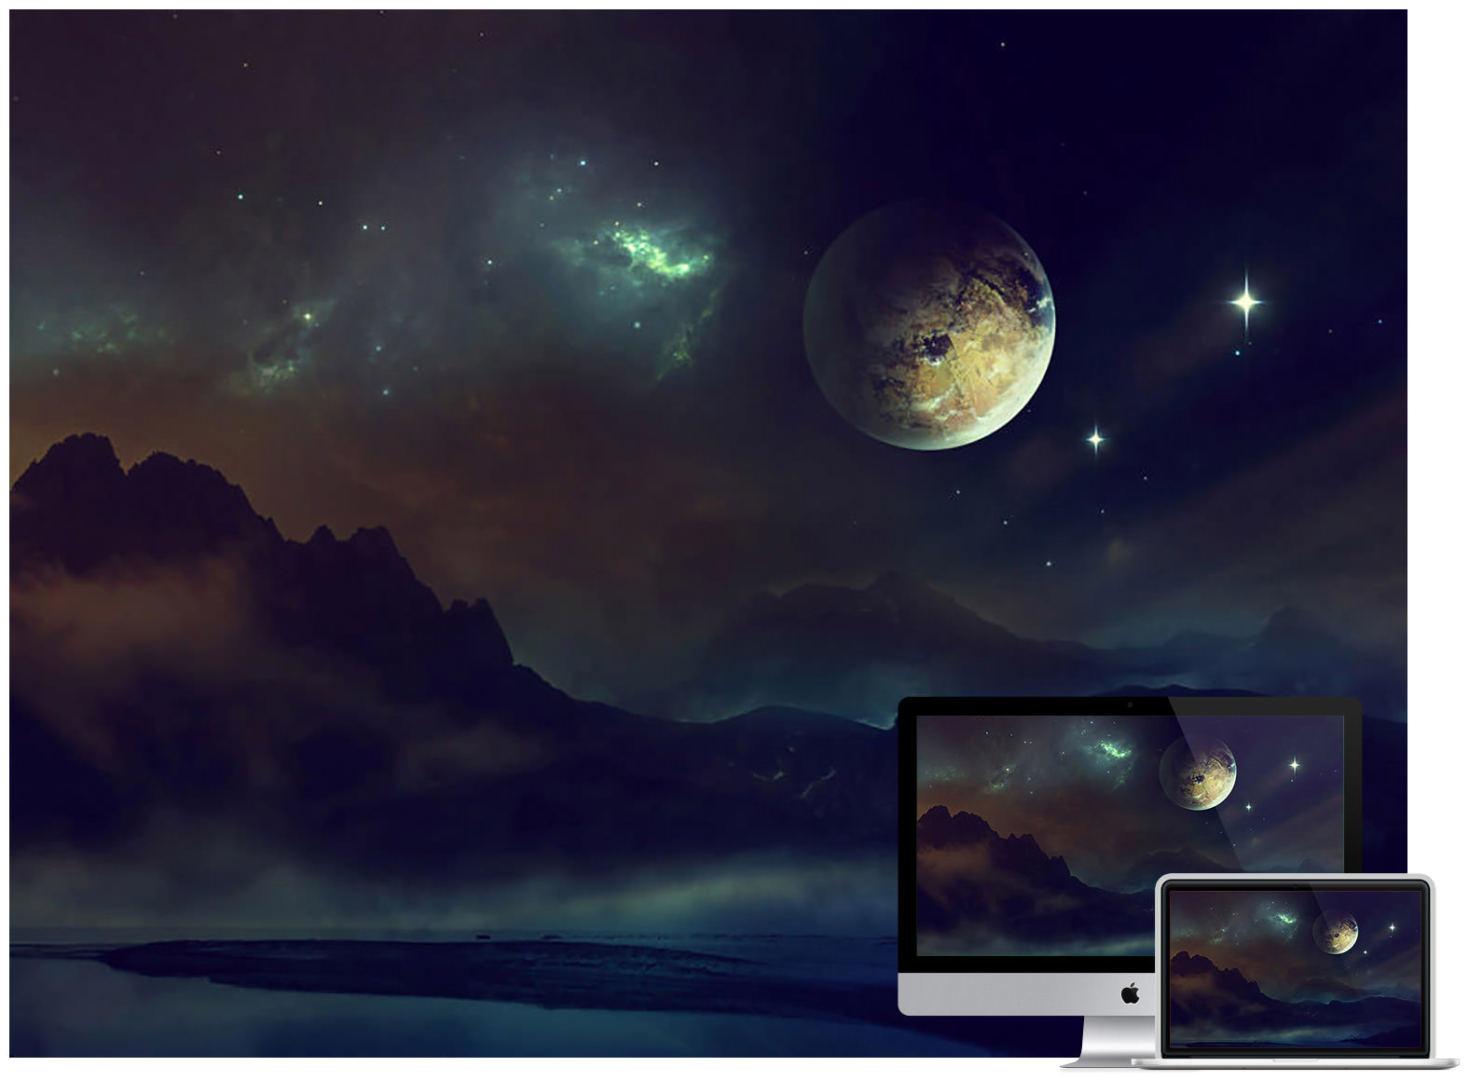 space-planet-light-night